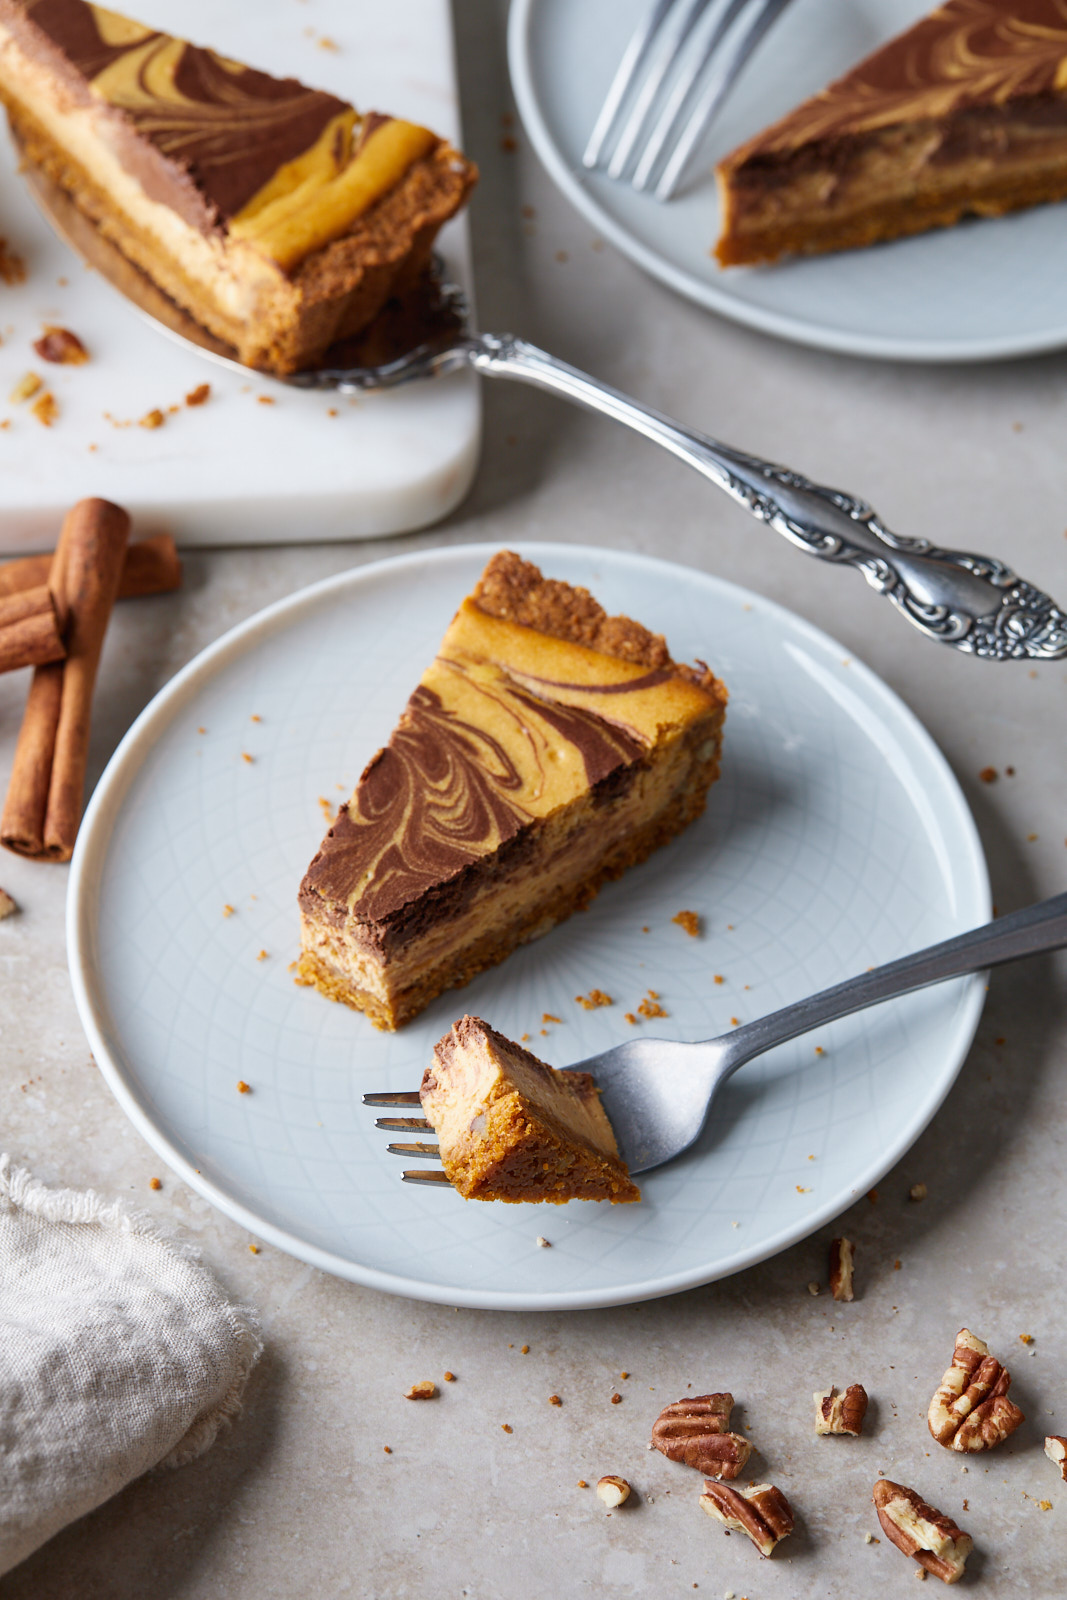 Marbled Chocolate Cheesecake Pumpkin Tart With A Biscoff Pecan Crust